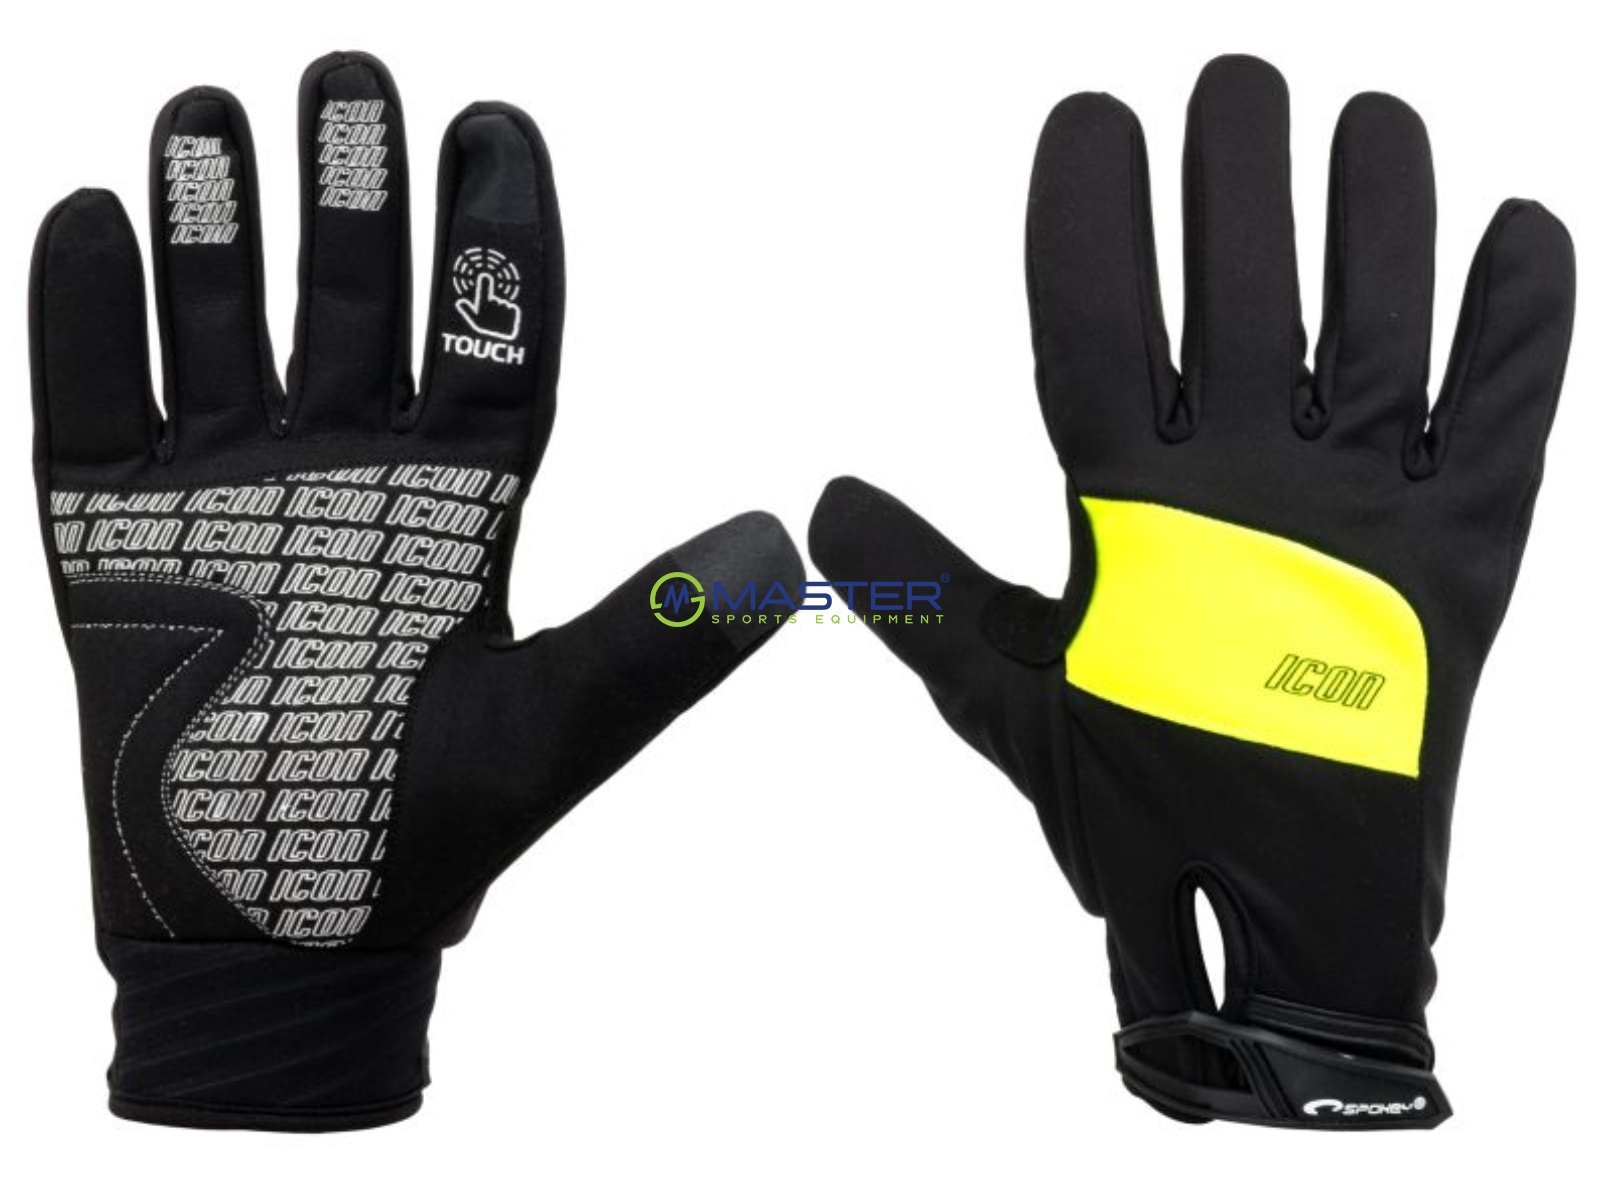 39940ac06ce Cyklistické rukavice SPOKEY Icon černo-žluté vel. S ...